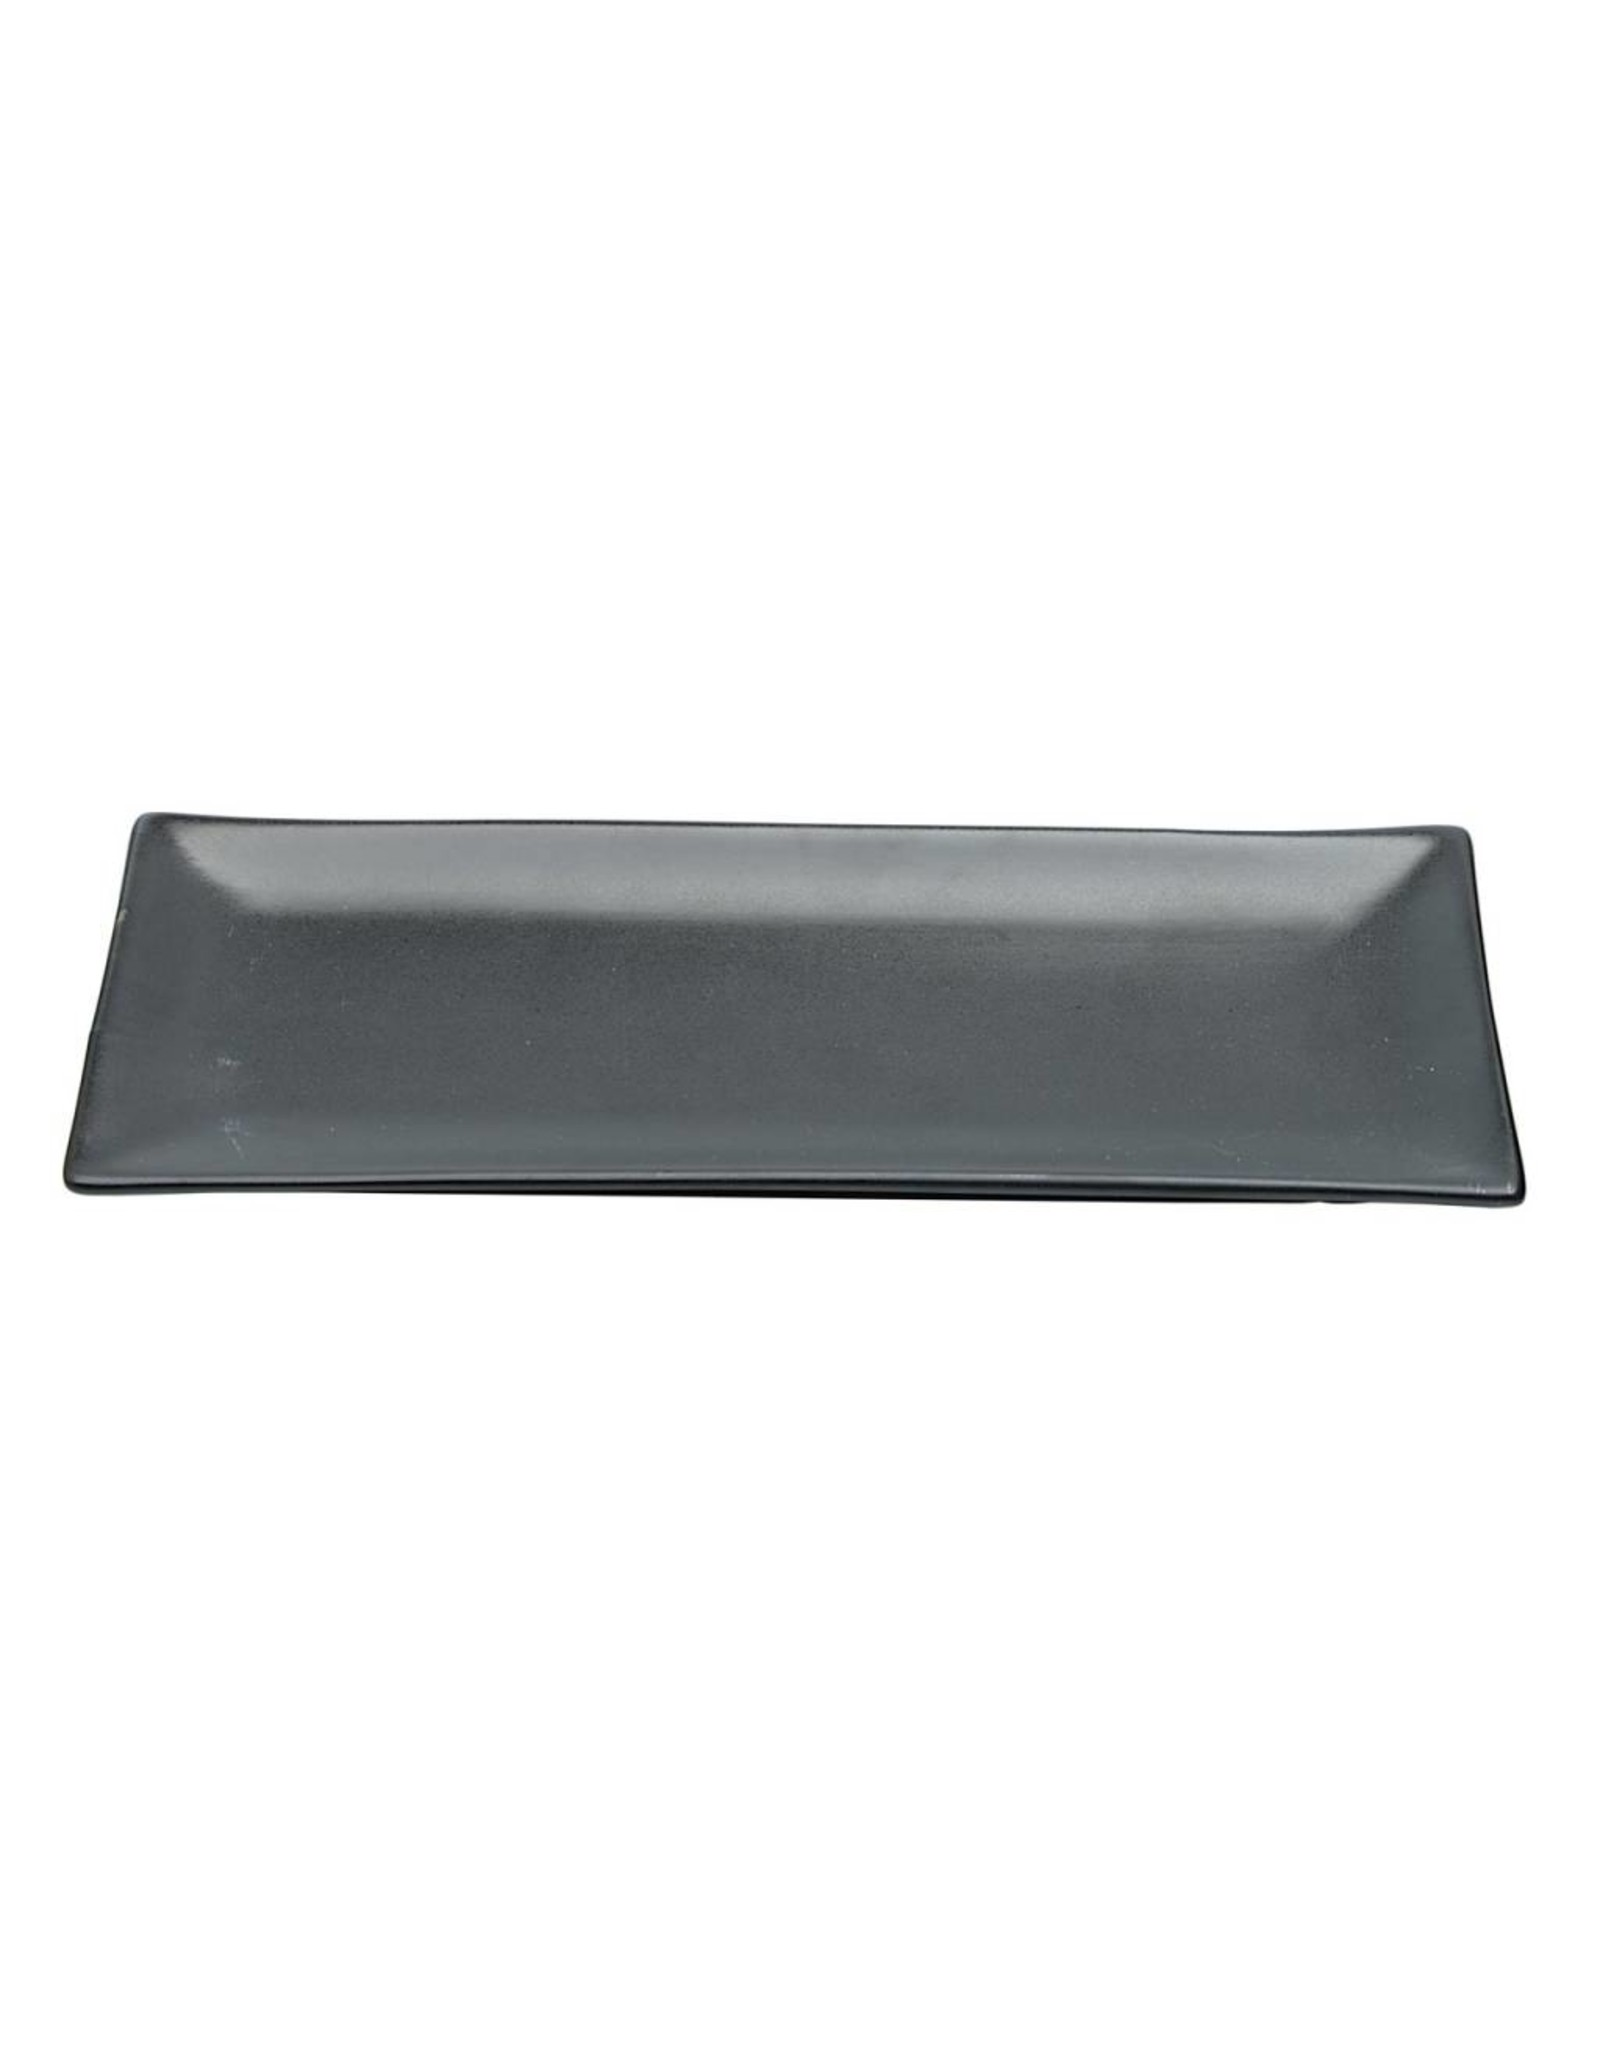 Tokyo Design Studio Black Series bord 26x11cm mat zwart